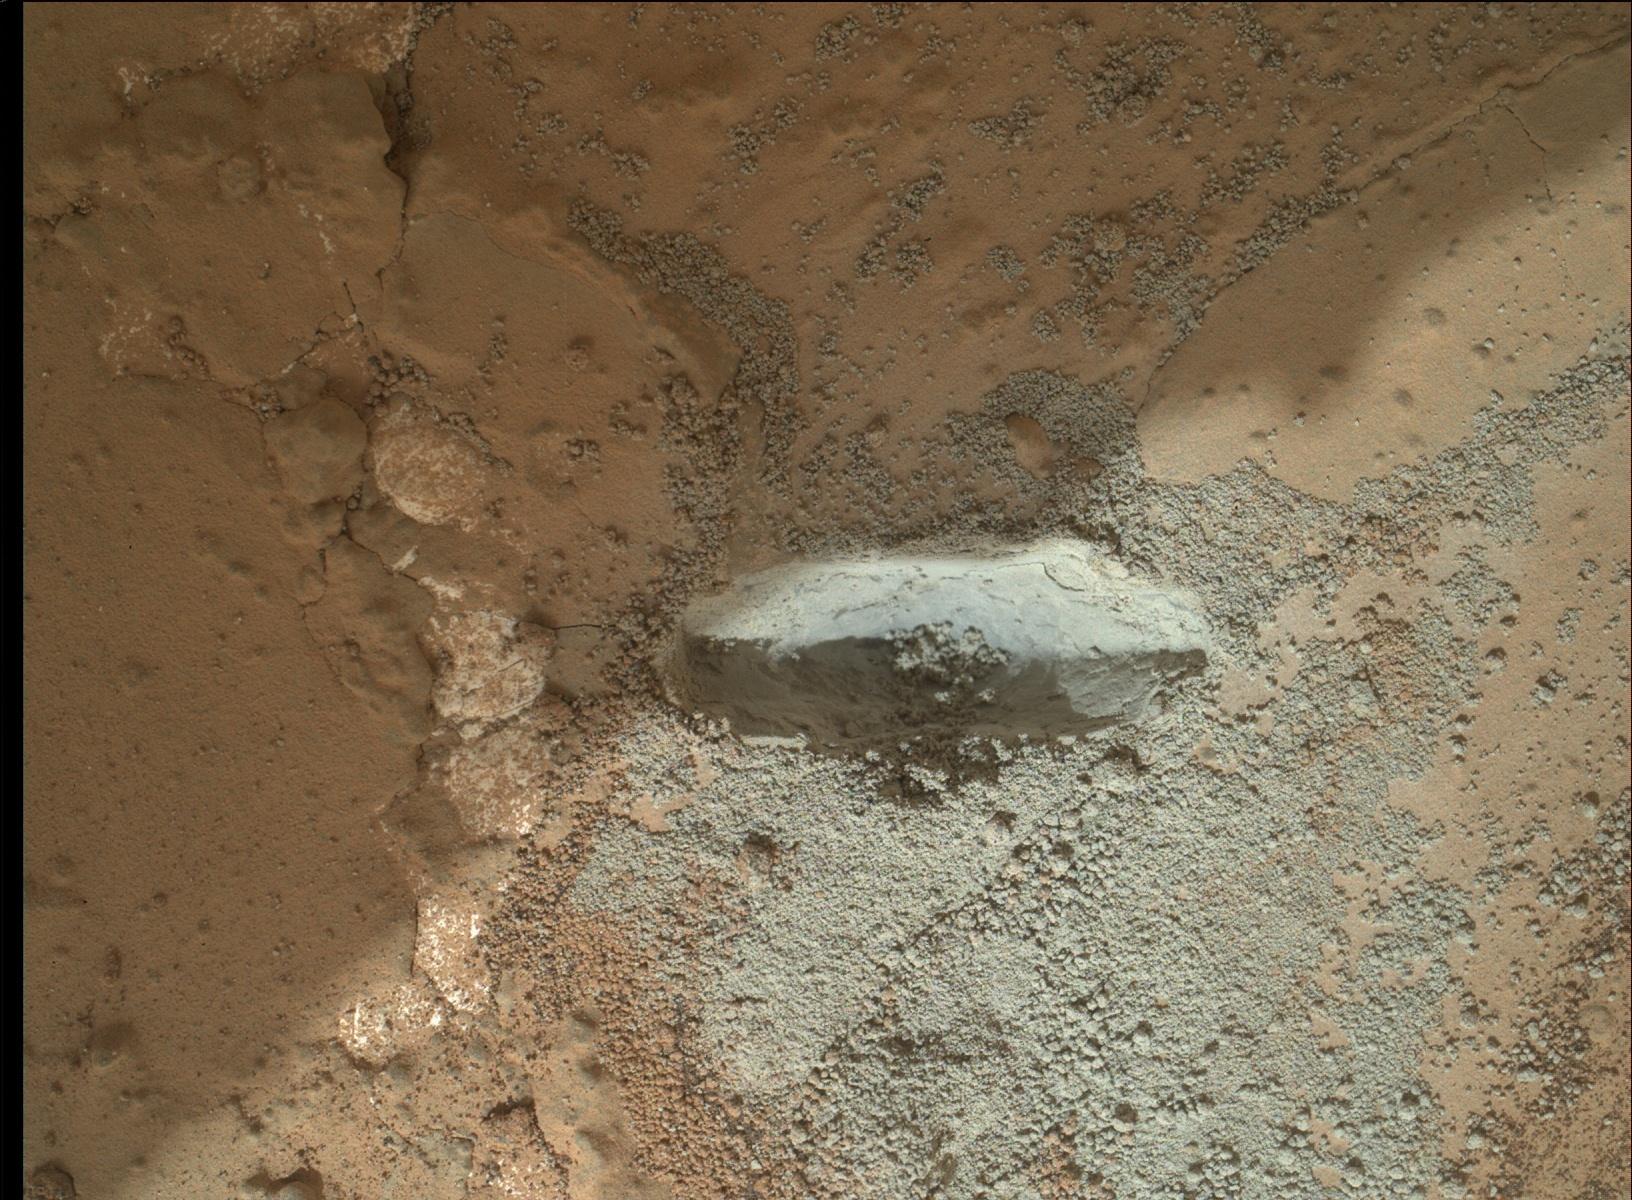 NASA's Curiosity Rover Hammers Into 1st Mars Rock